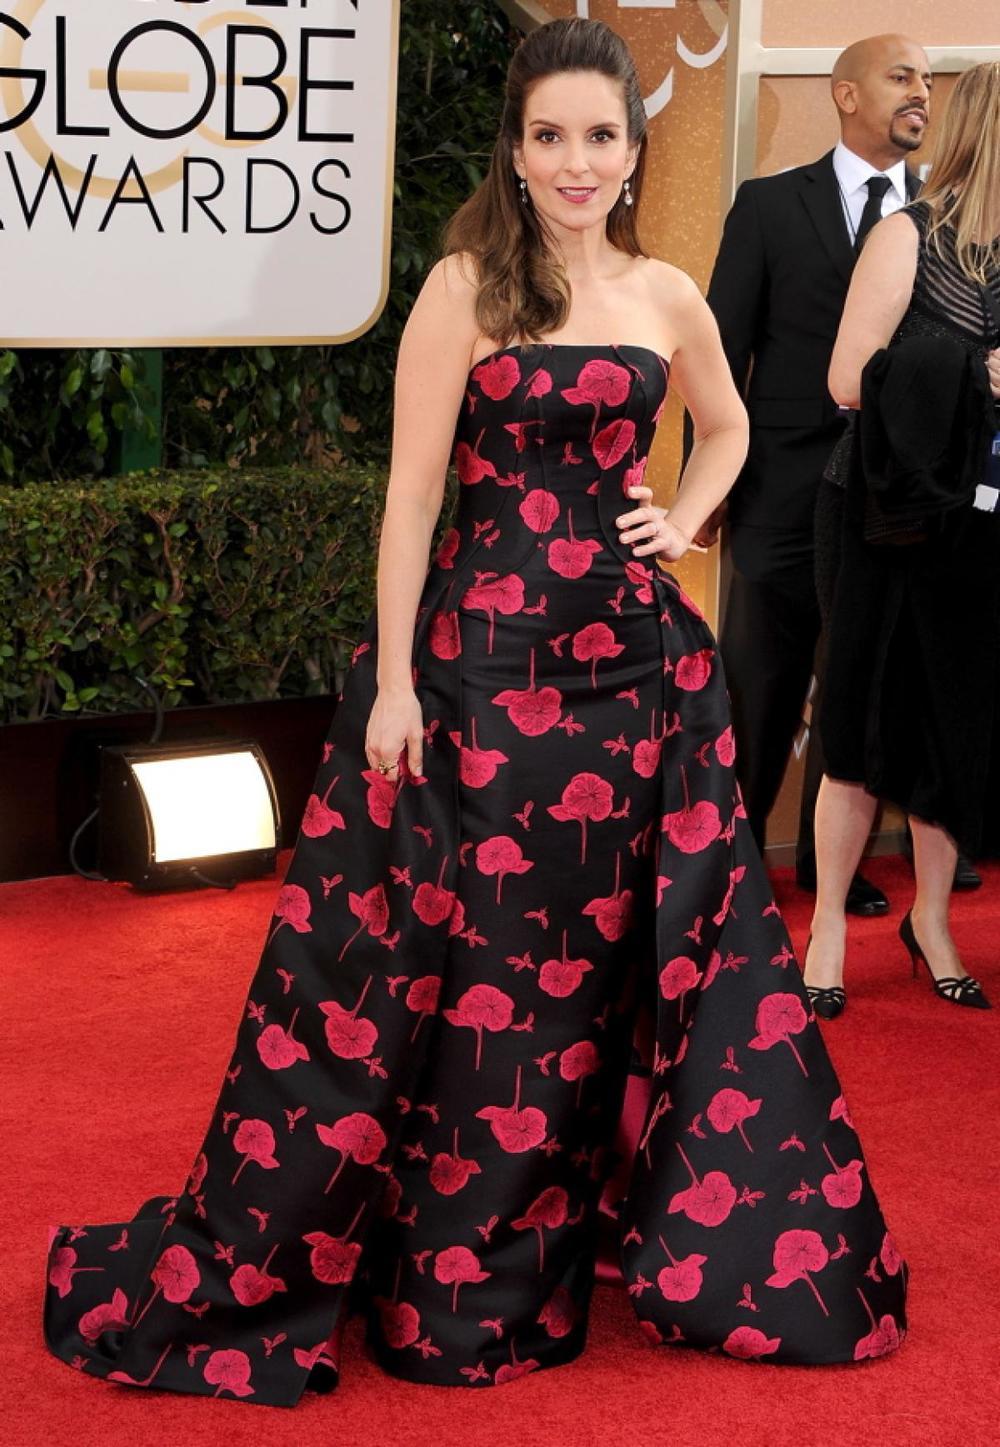 Tina Fey in Carolina Herrera gown with prints!